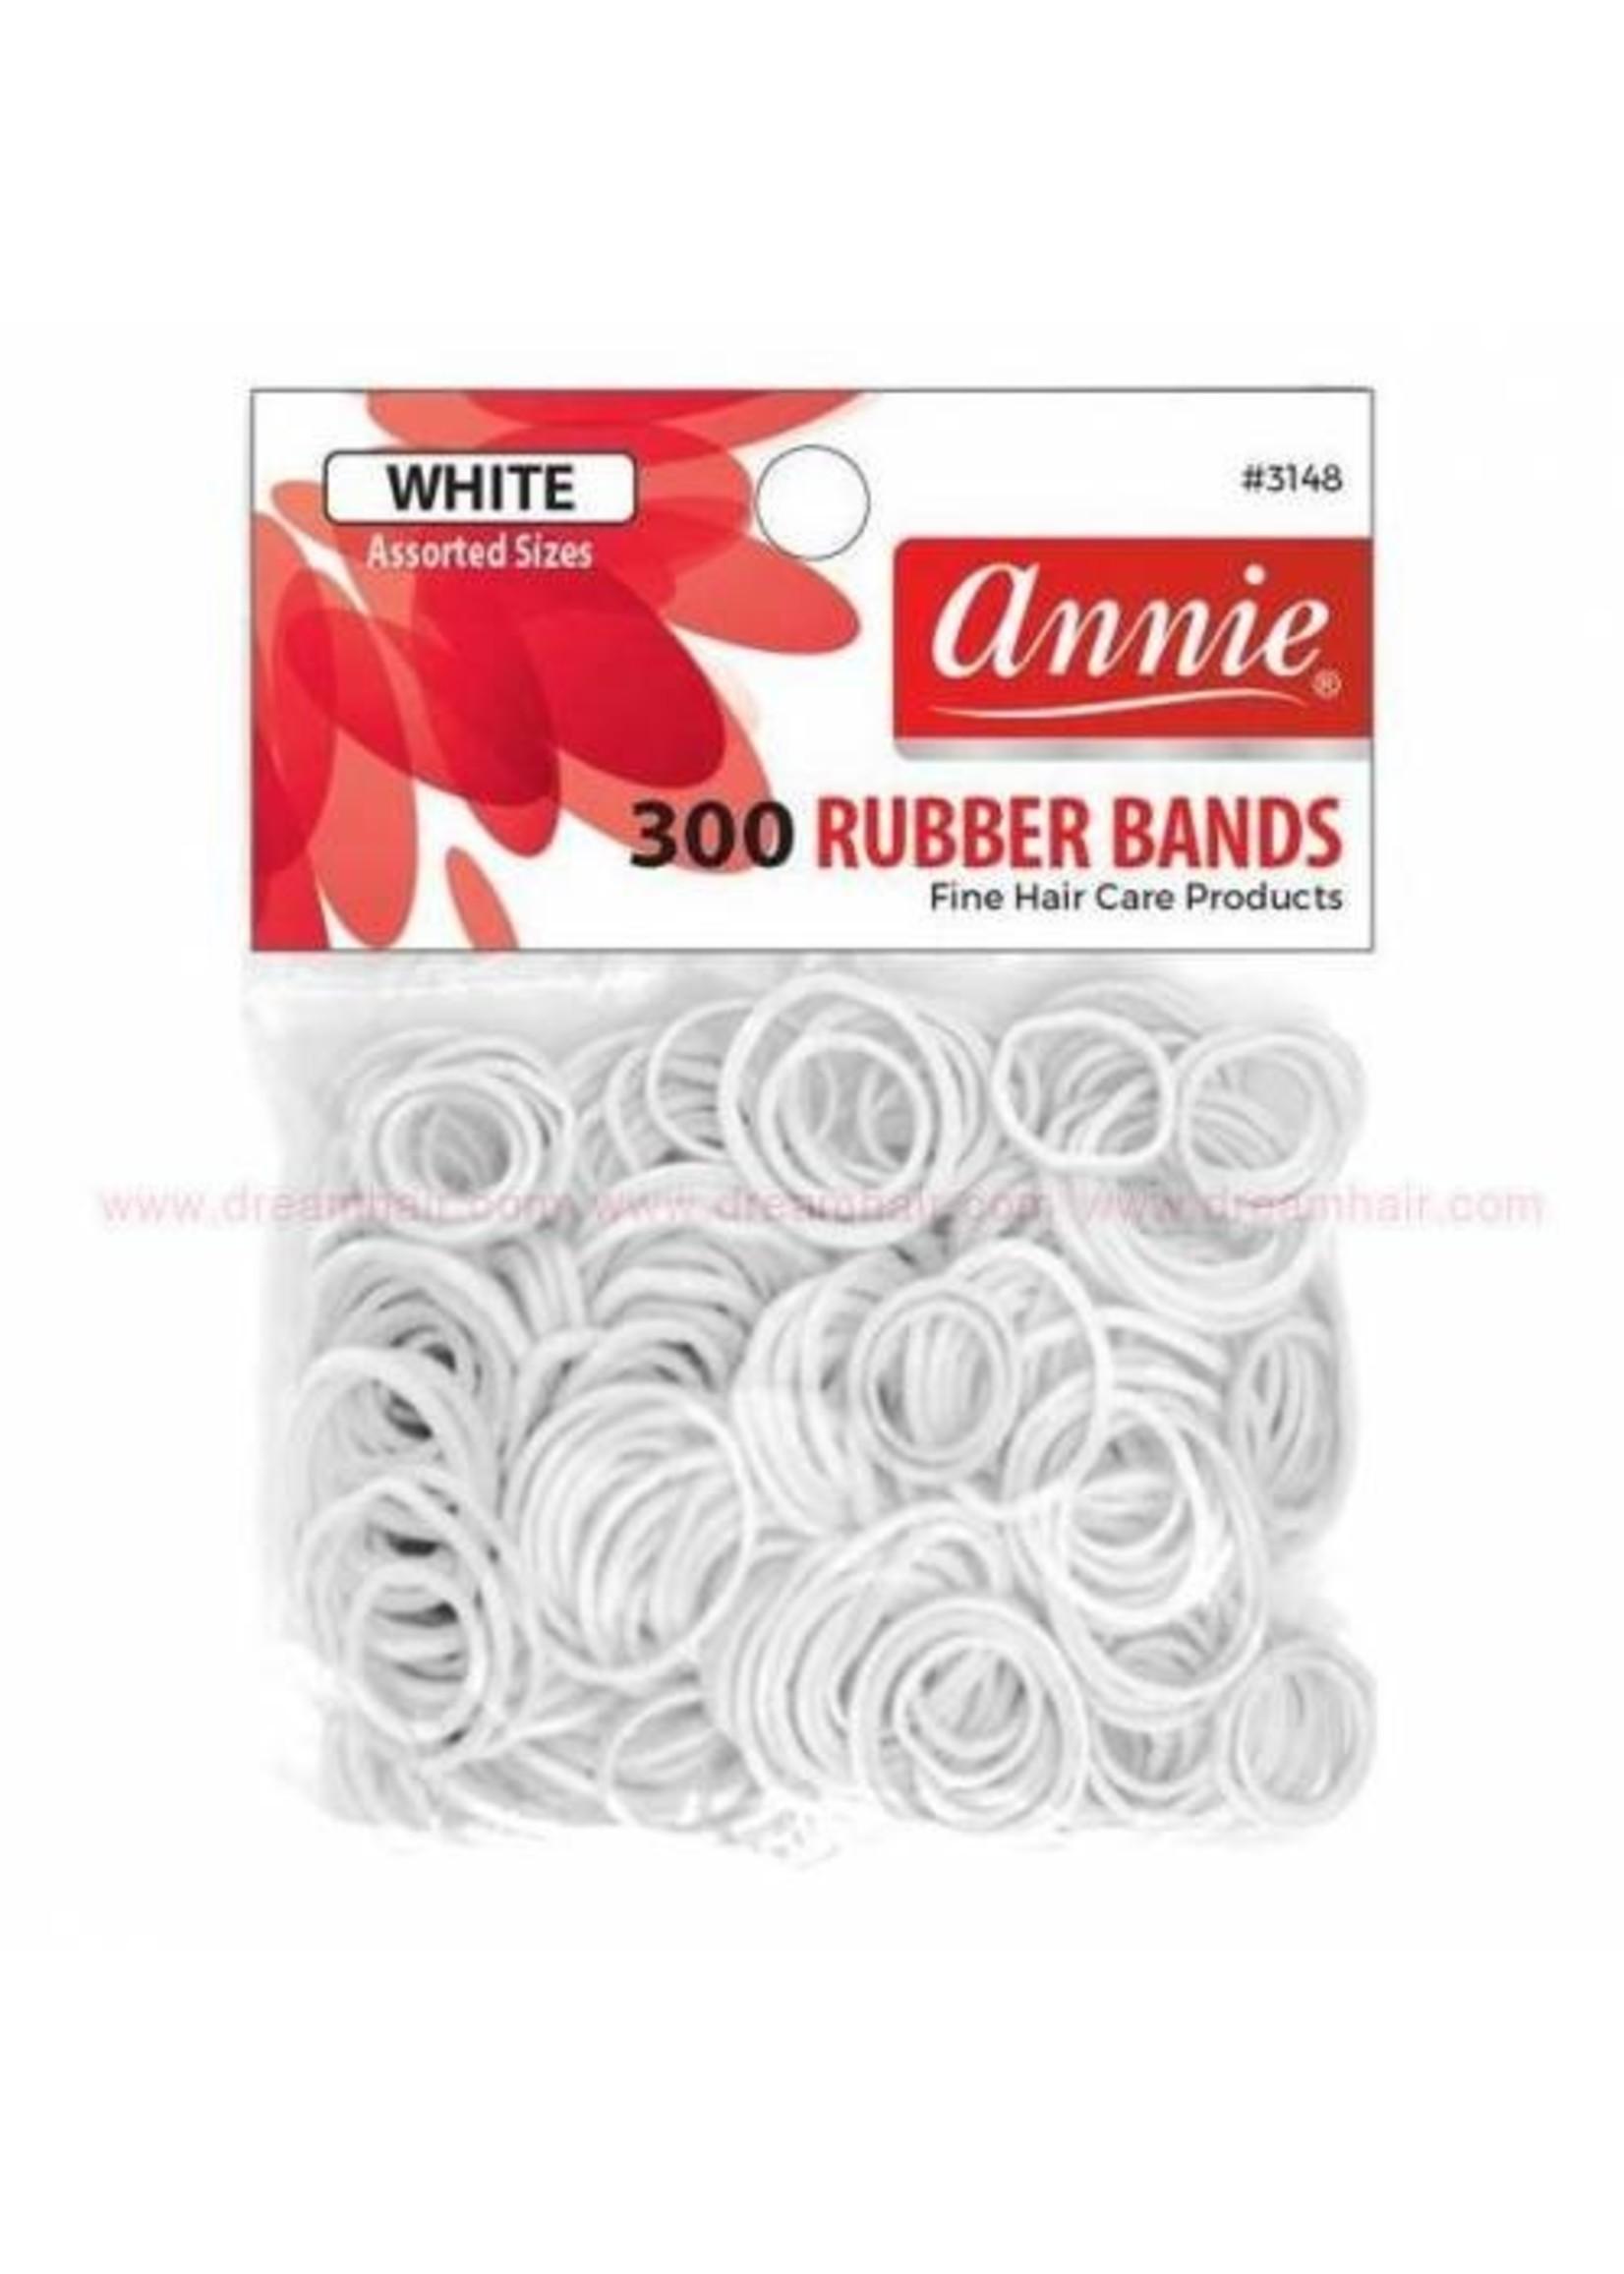 Annie Rubber Bands 300ct White